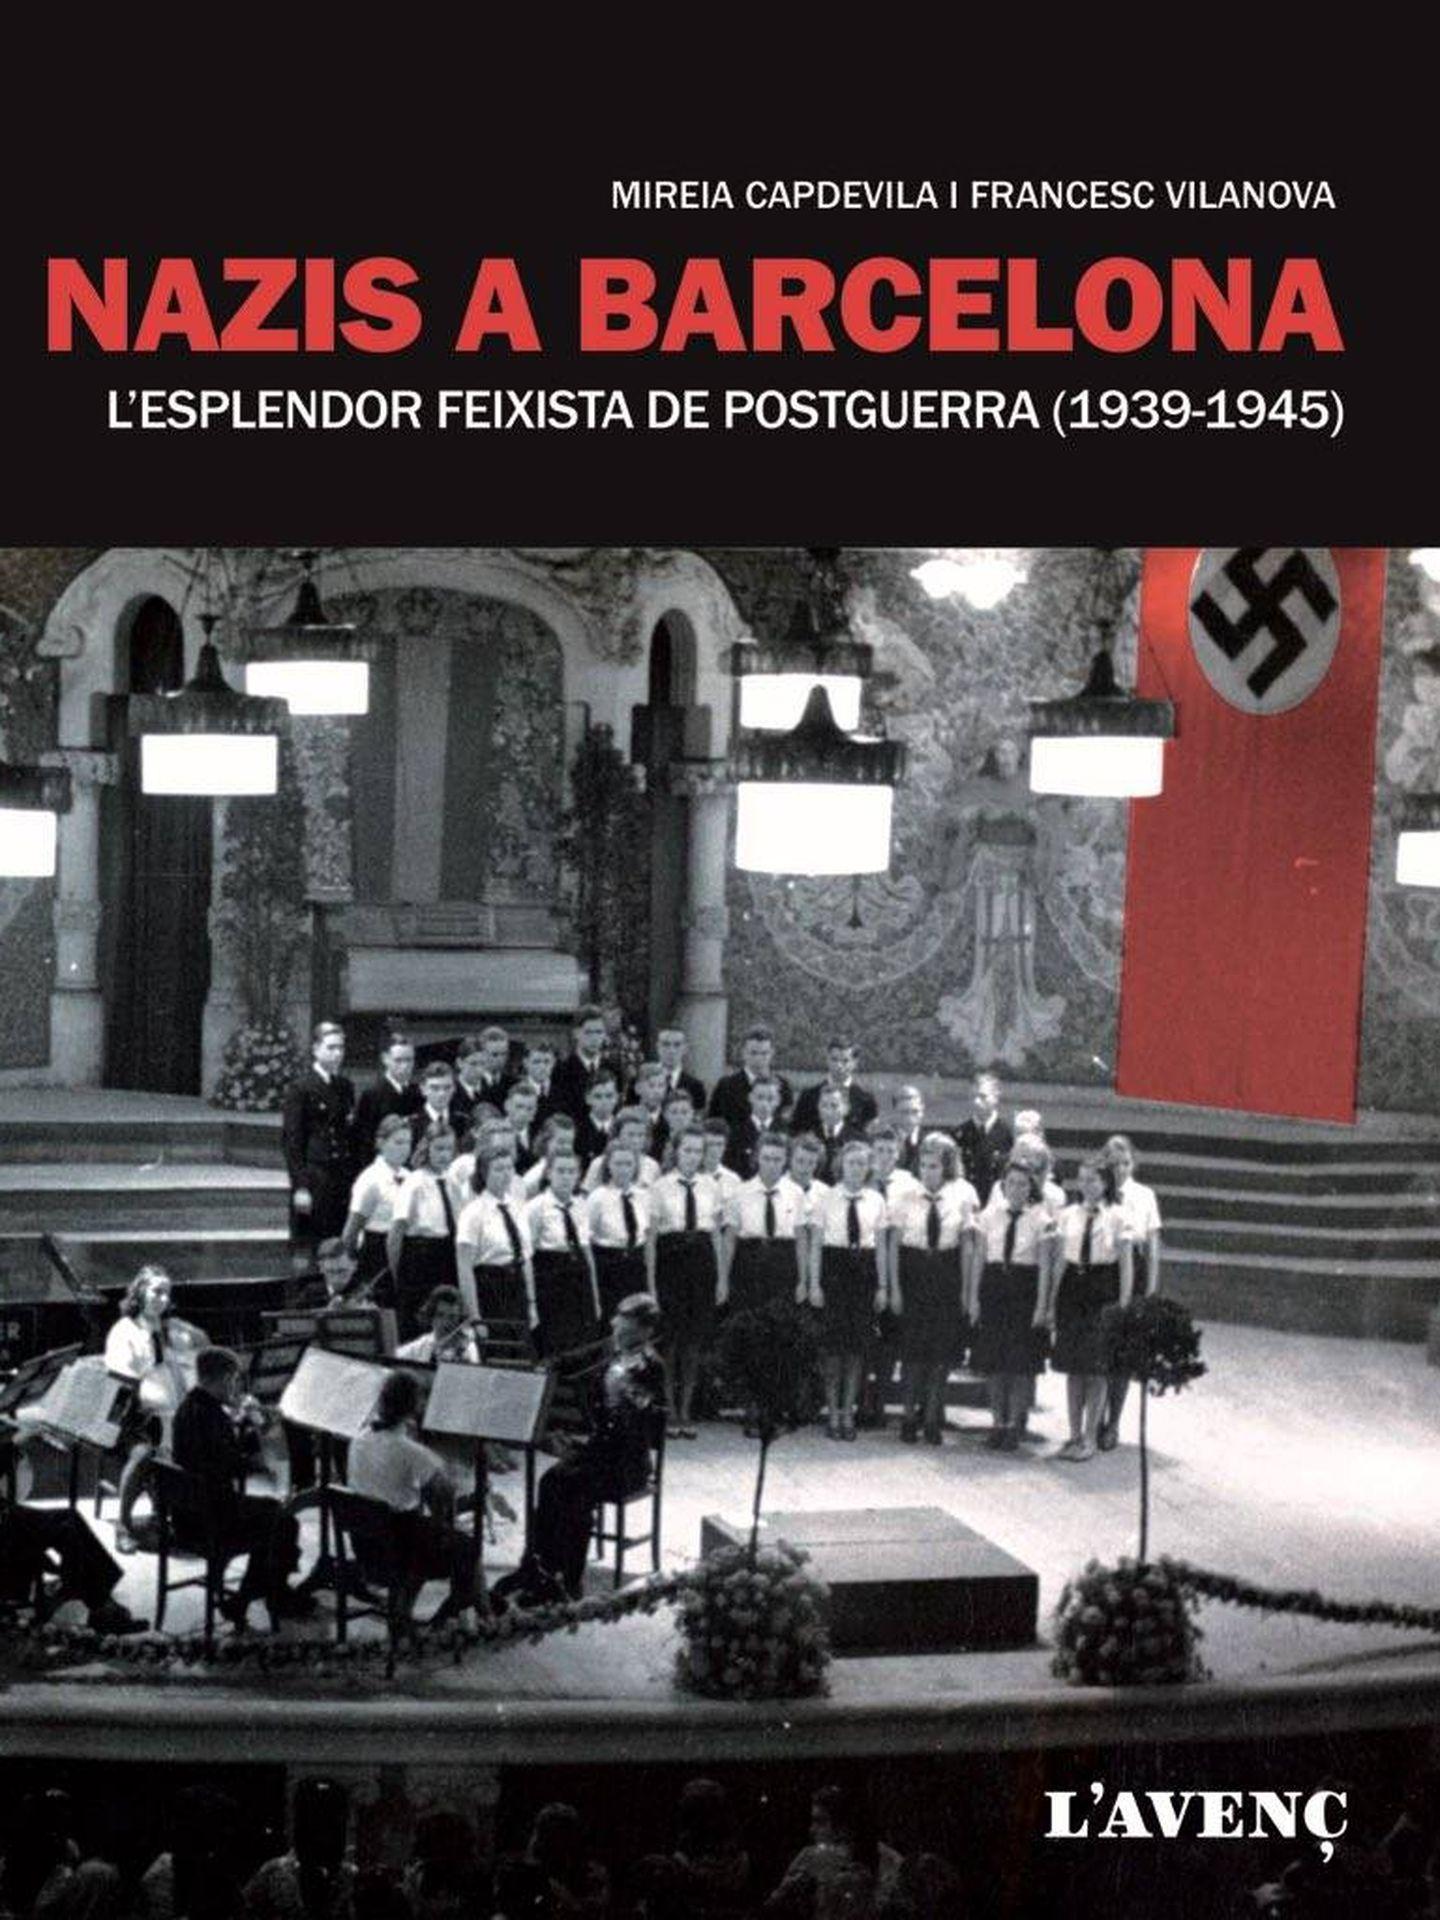 'Nazis a Barcelona'